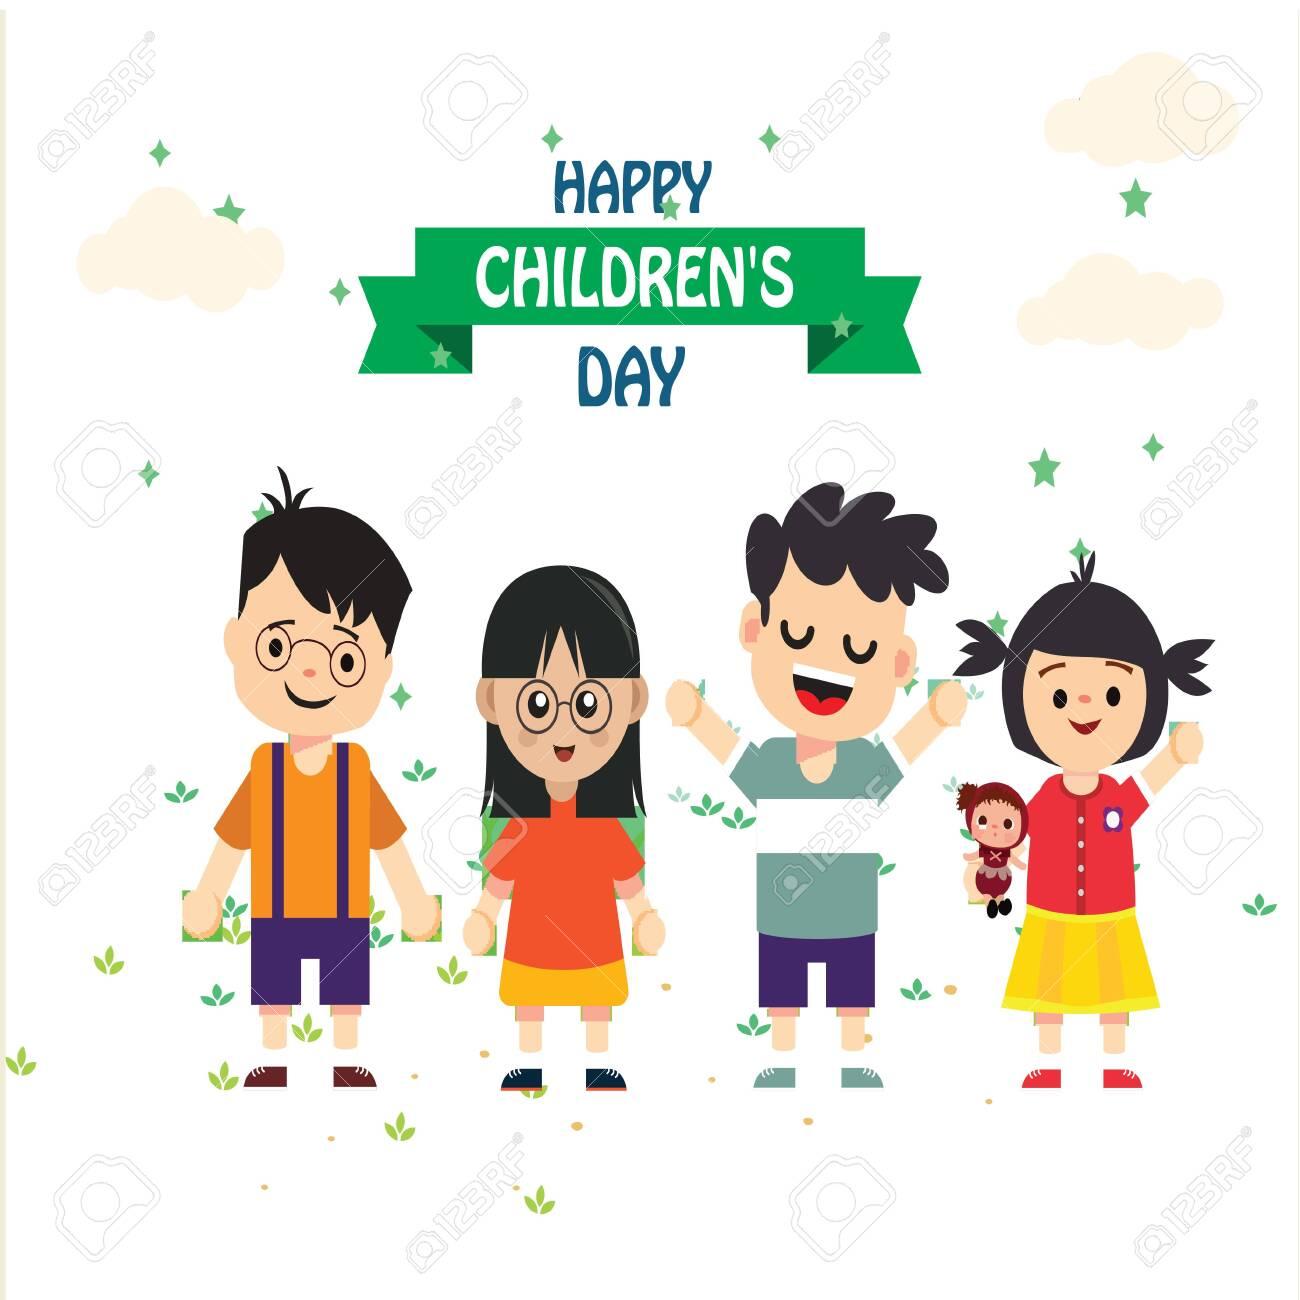 Premium Vector | Happy children's day